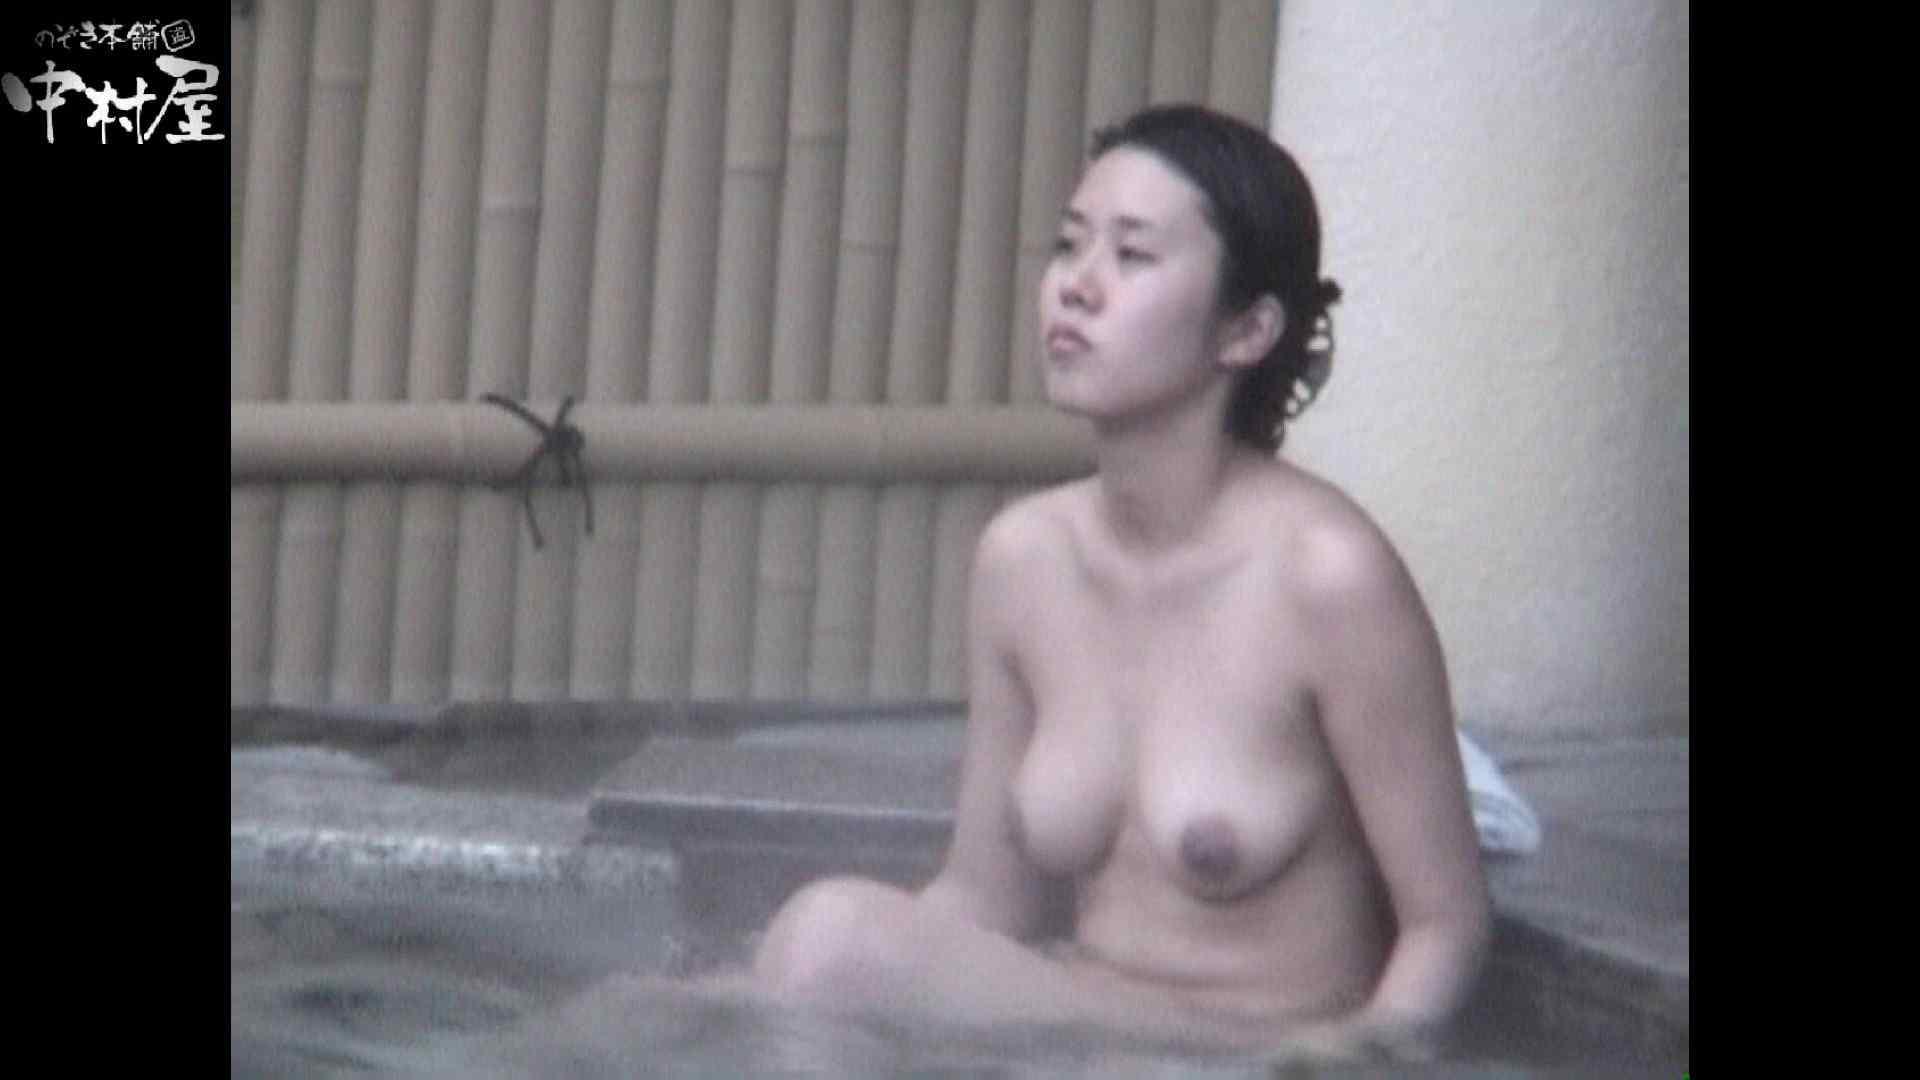 Aquaな露天風呂Vol.923 盗撮  84pic 49